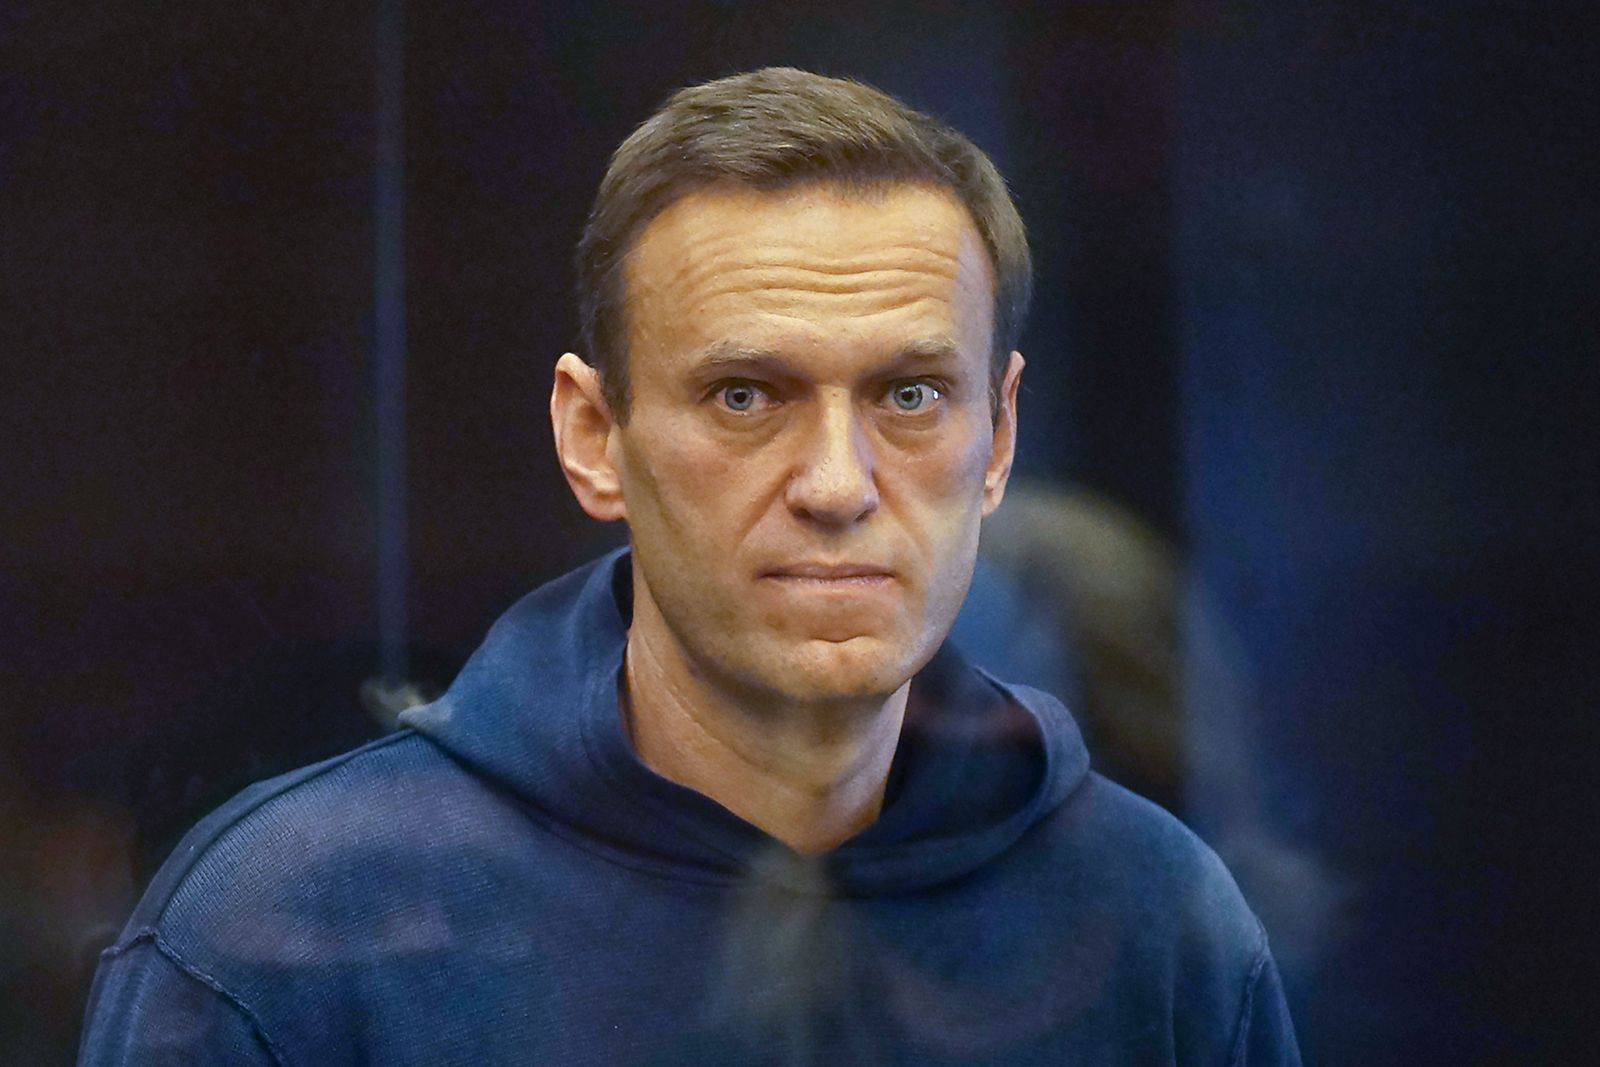 Gericht entscheidet ??ber Nawalny